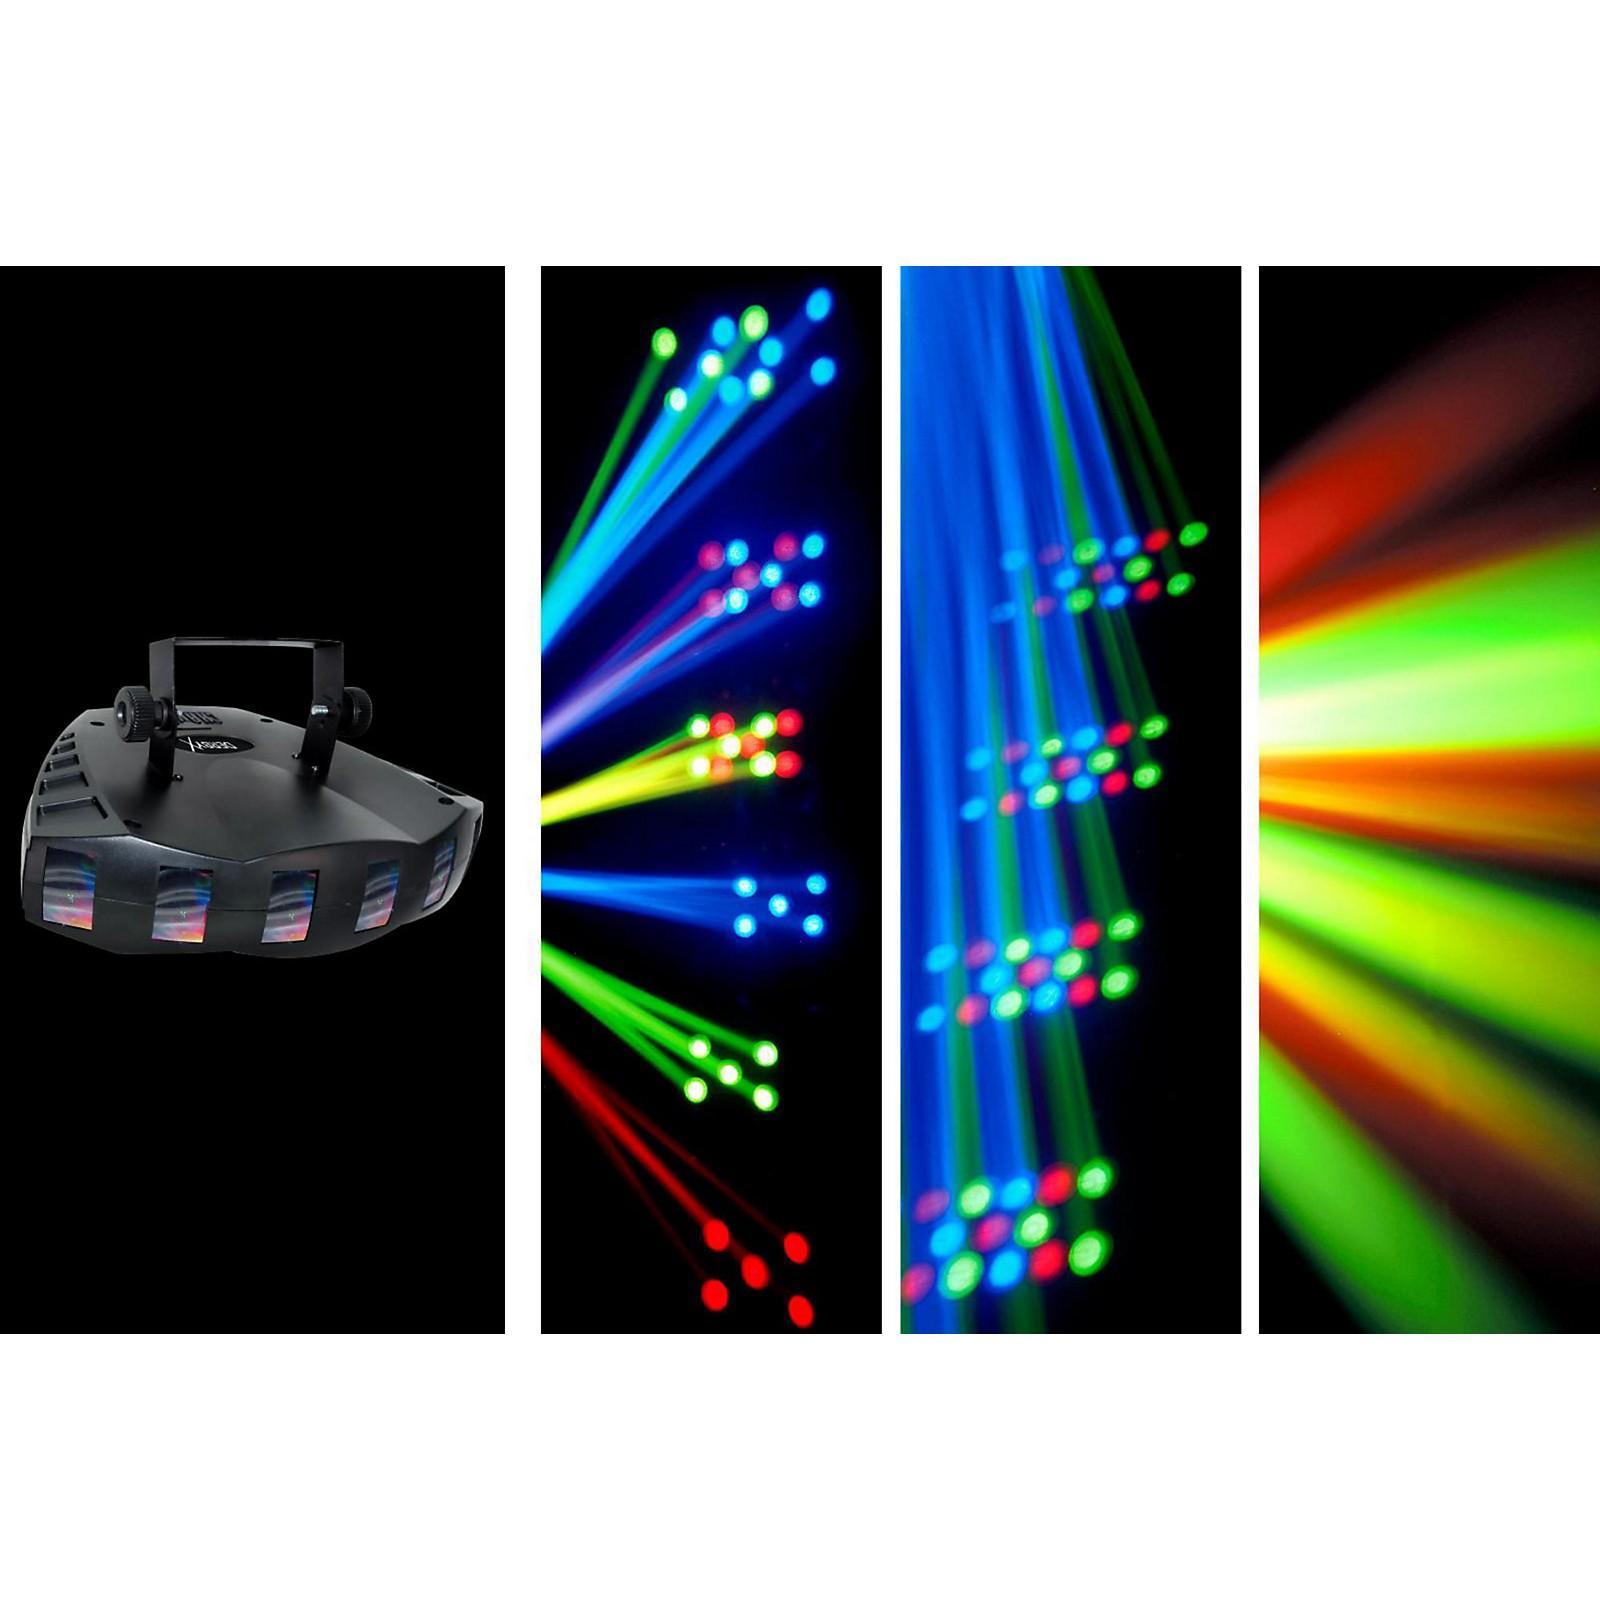 CHAUVET DJ Derby X LED Derby Static/Blackout Effect and Strobe Light